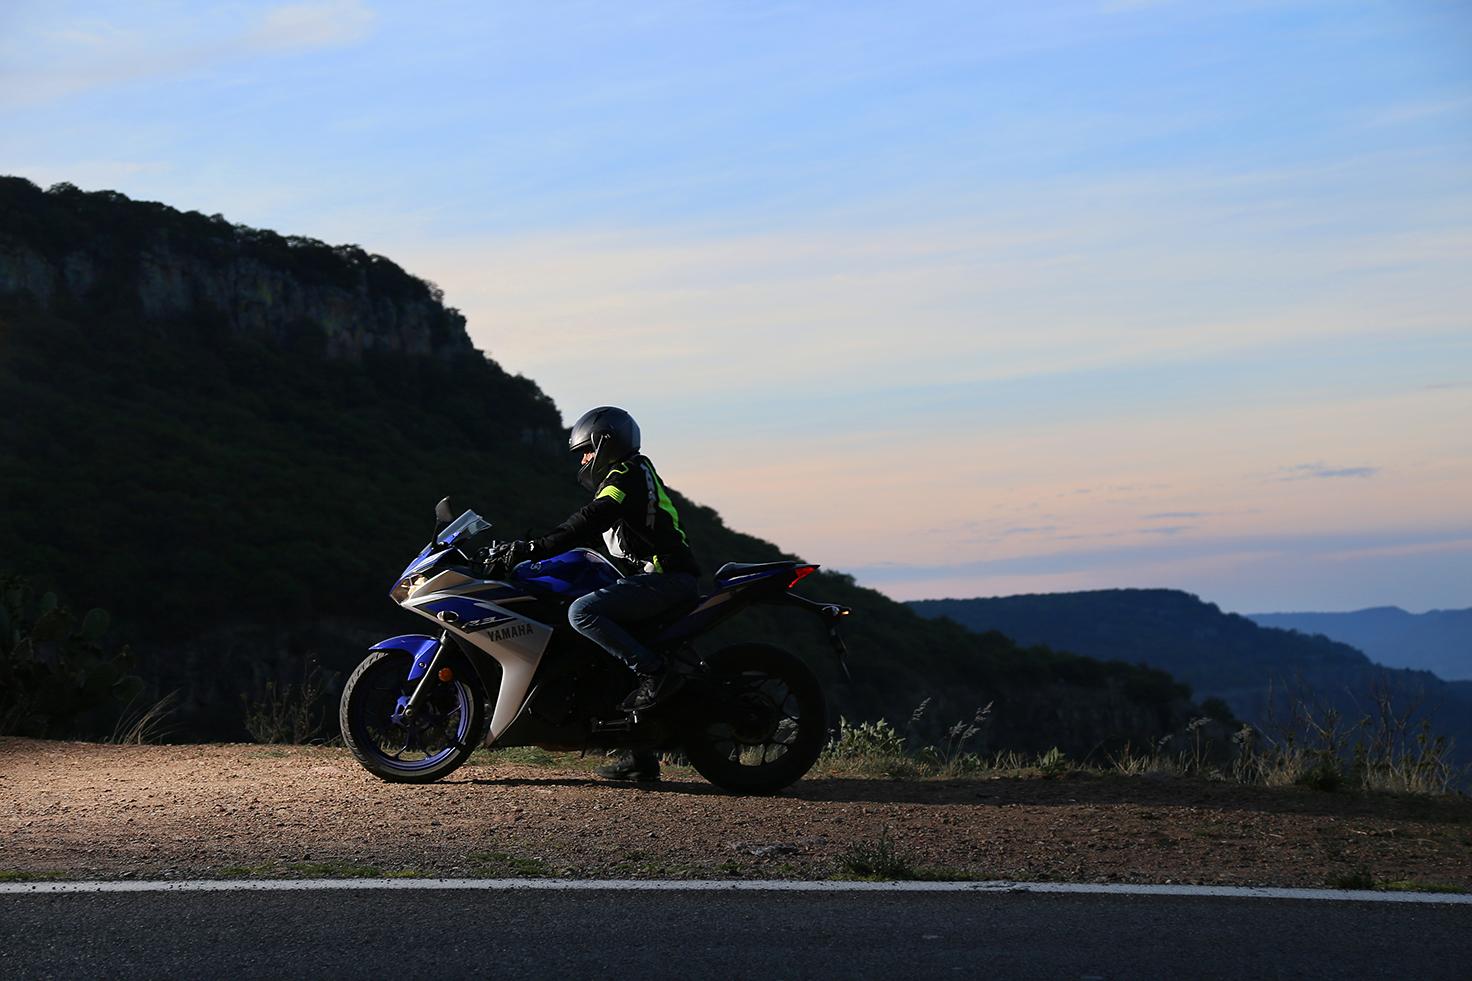 Maroge-Angela-Velazquez-fotografia-ezequiel-moto-11..